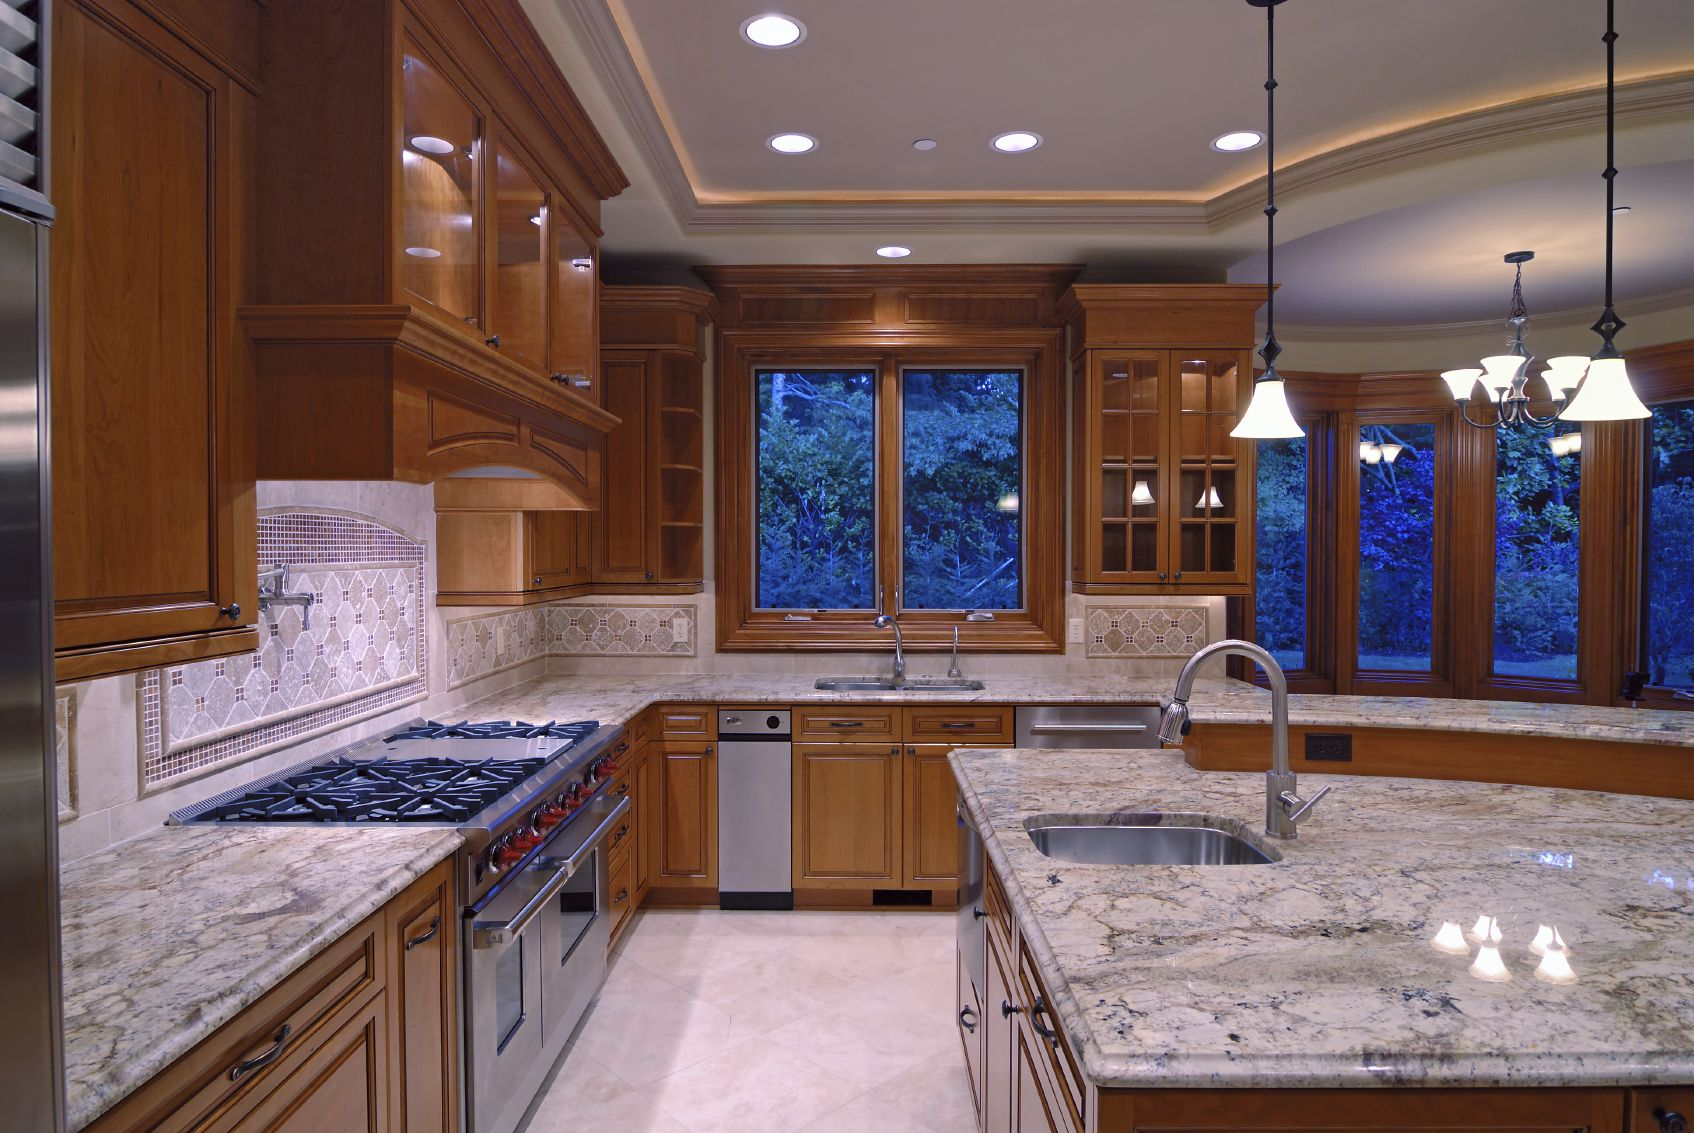 recessed lighting in kitchens ideas. 501 Custom Kitchen Ideas For 2018 (Pictures) Recessed Lighting In Kitchens D